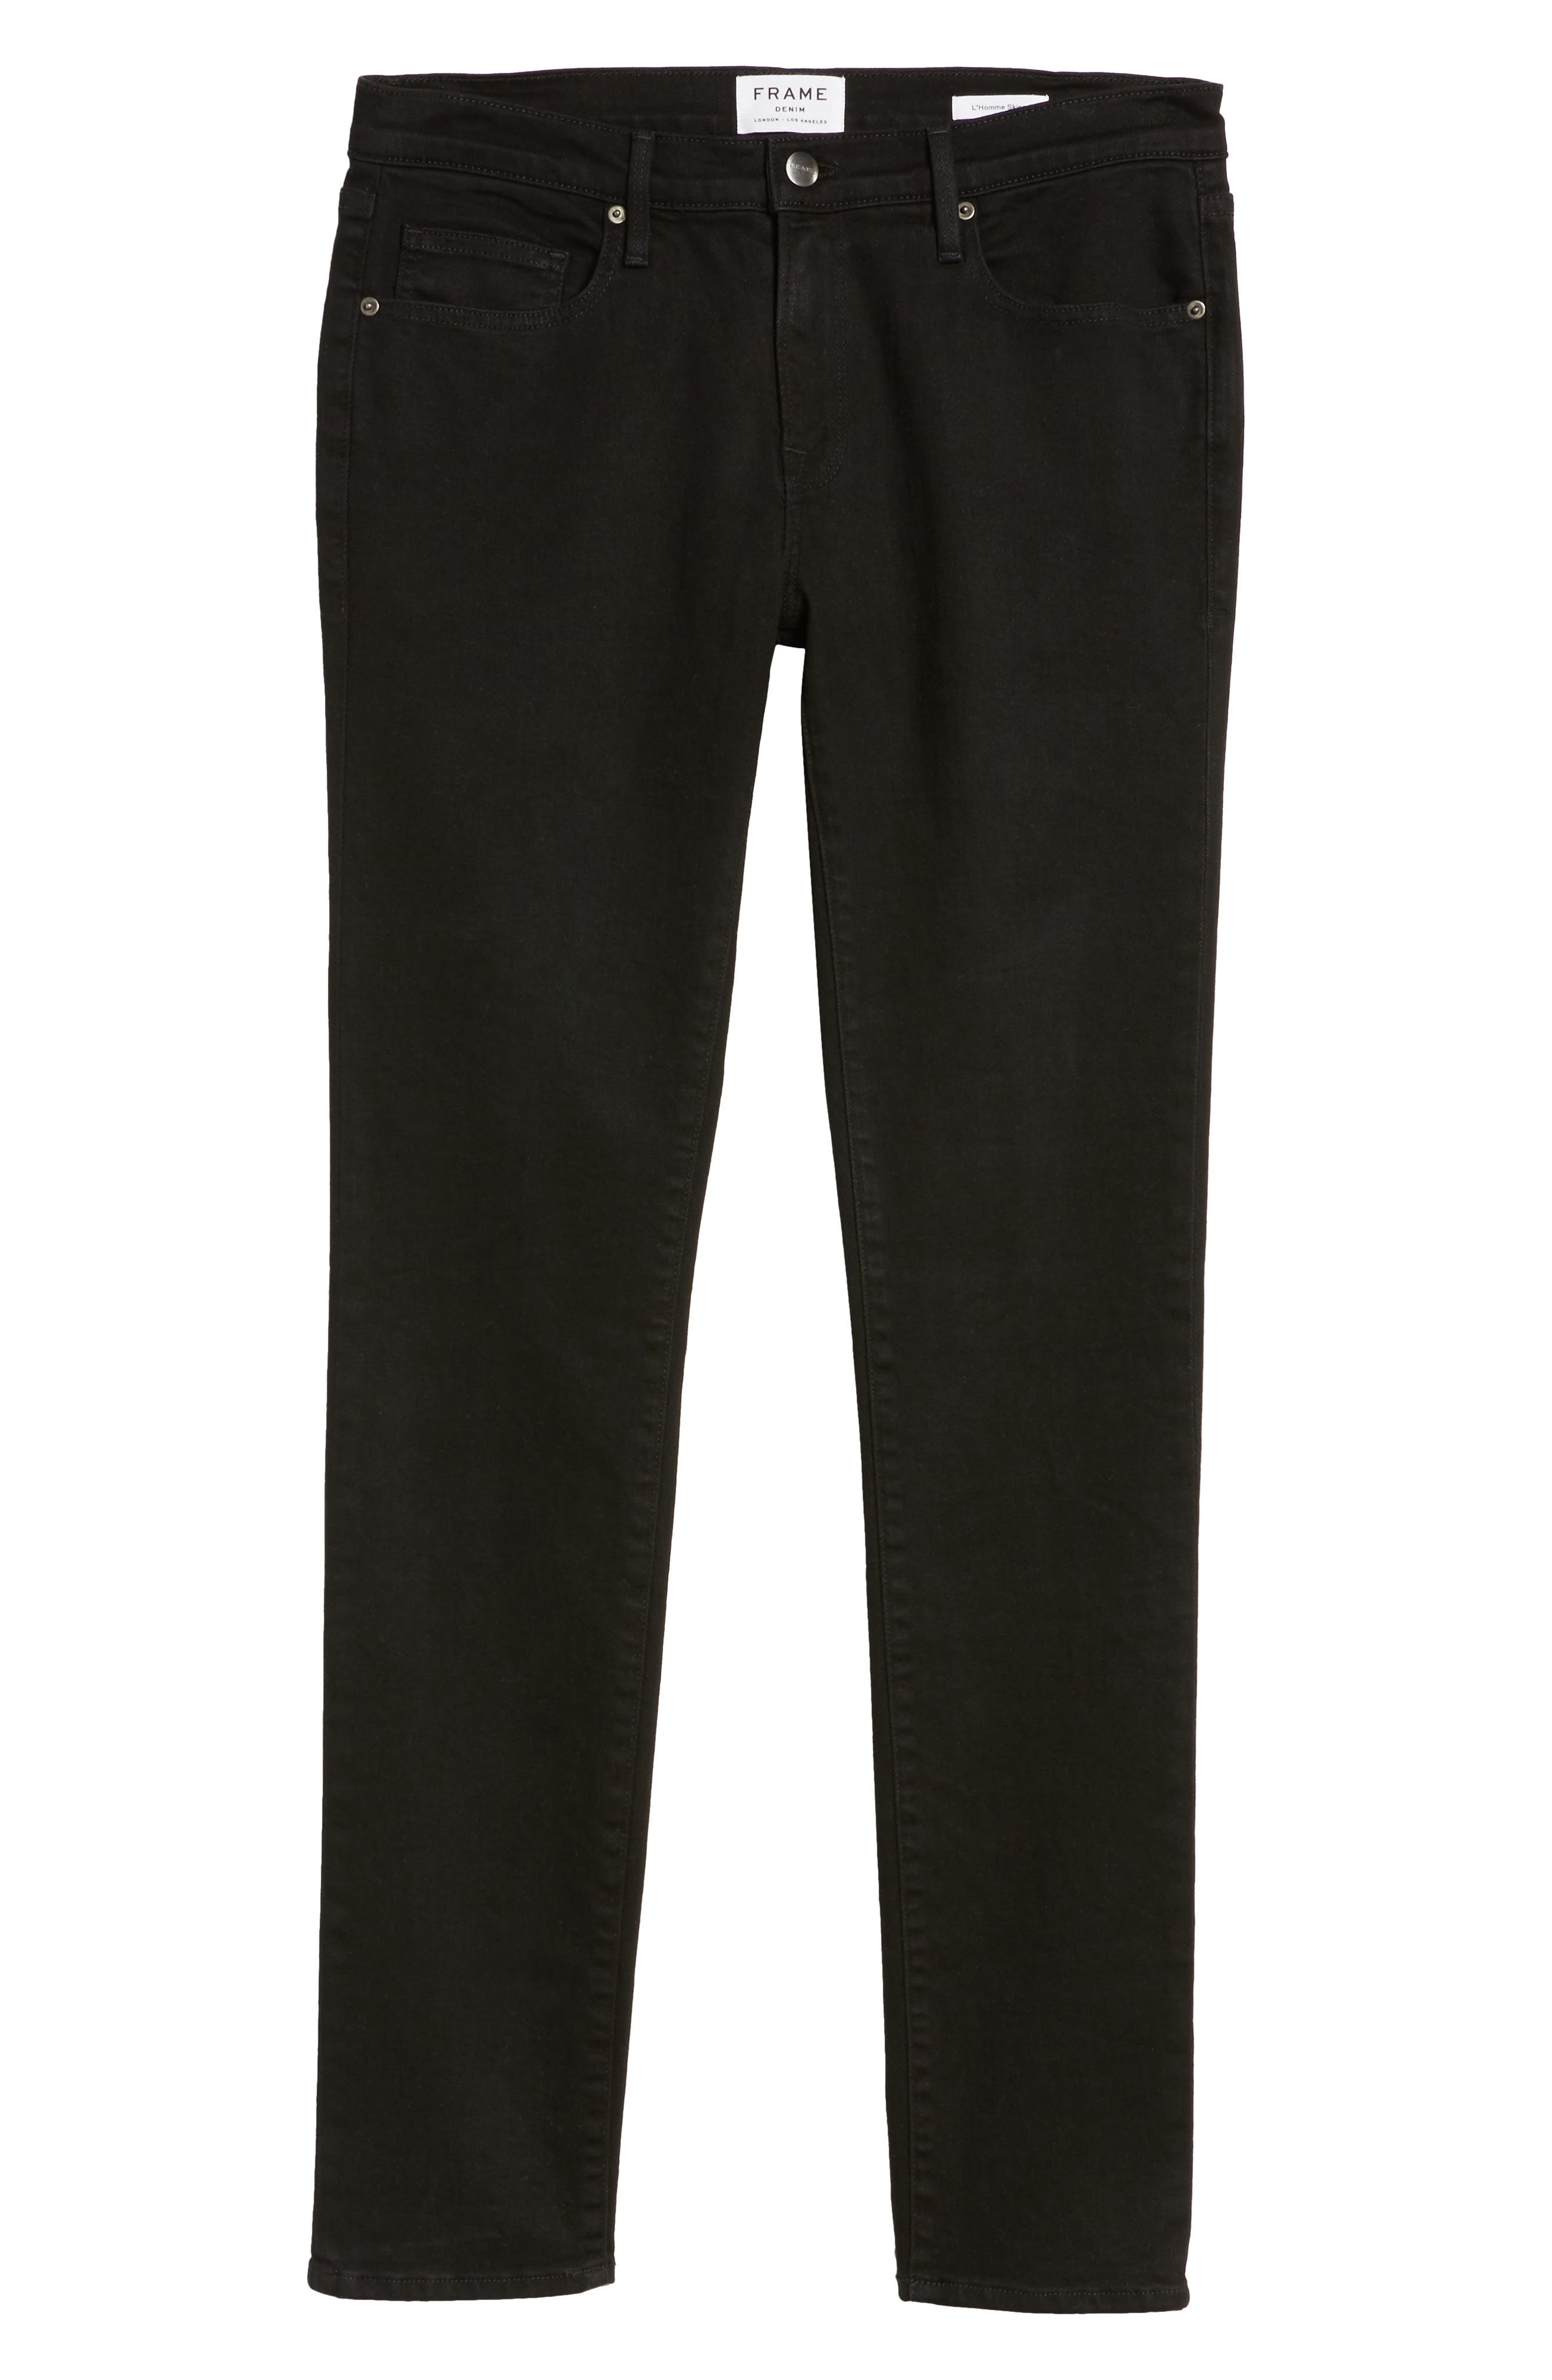 FRAME, L'Homme Skinny Fit Jeans, Alternate thumbnail 7, color, NOIR